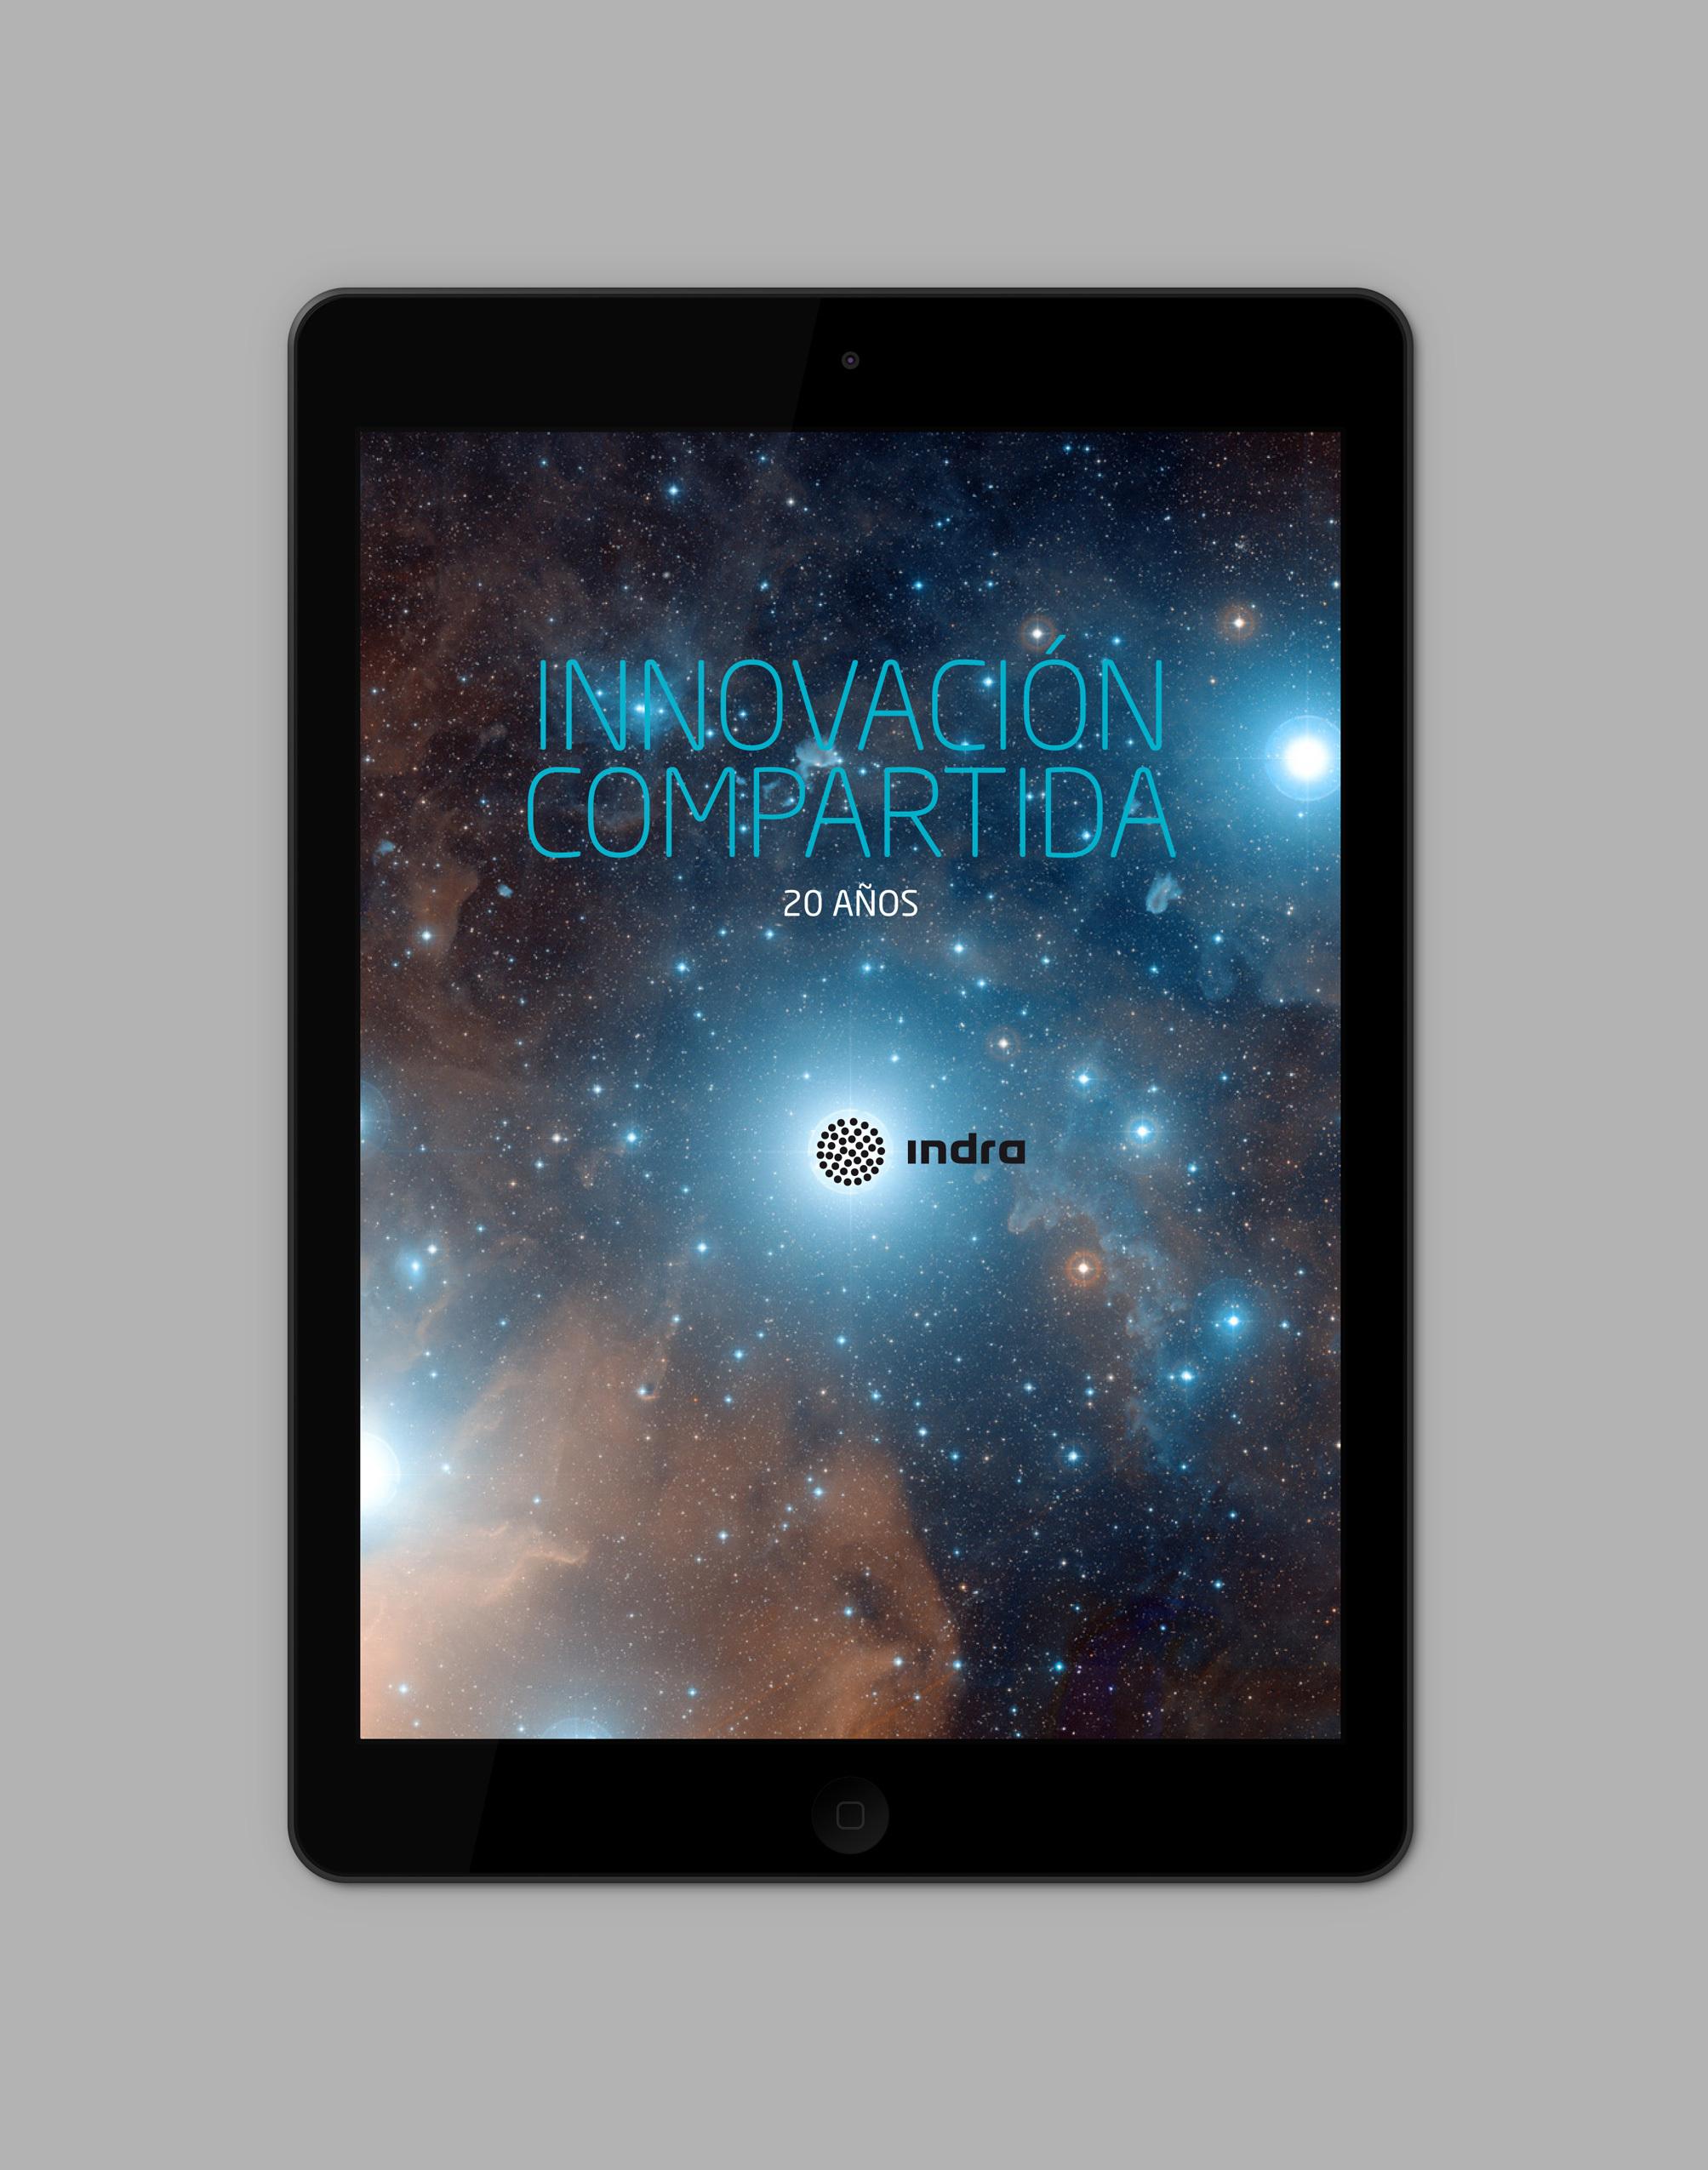 iPad-Air_Indra01.jpg